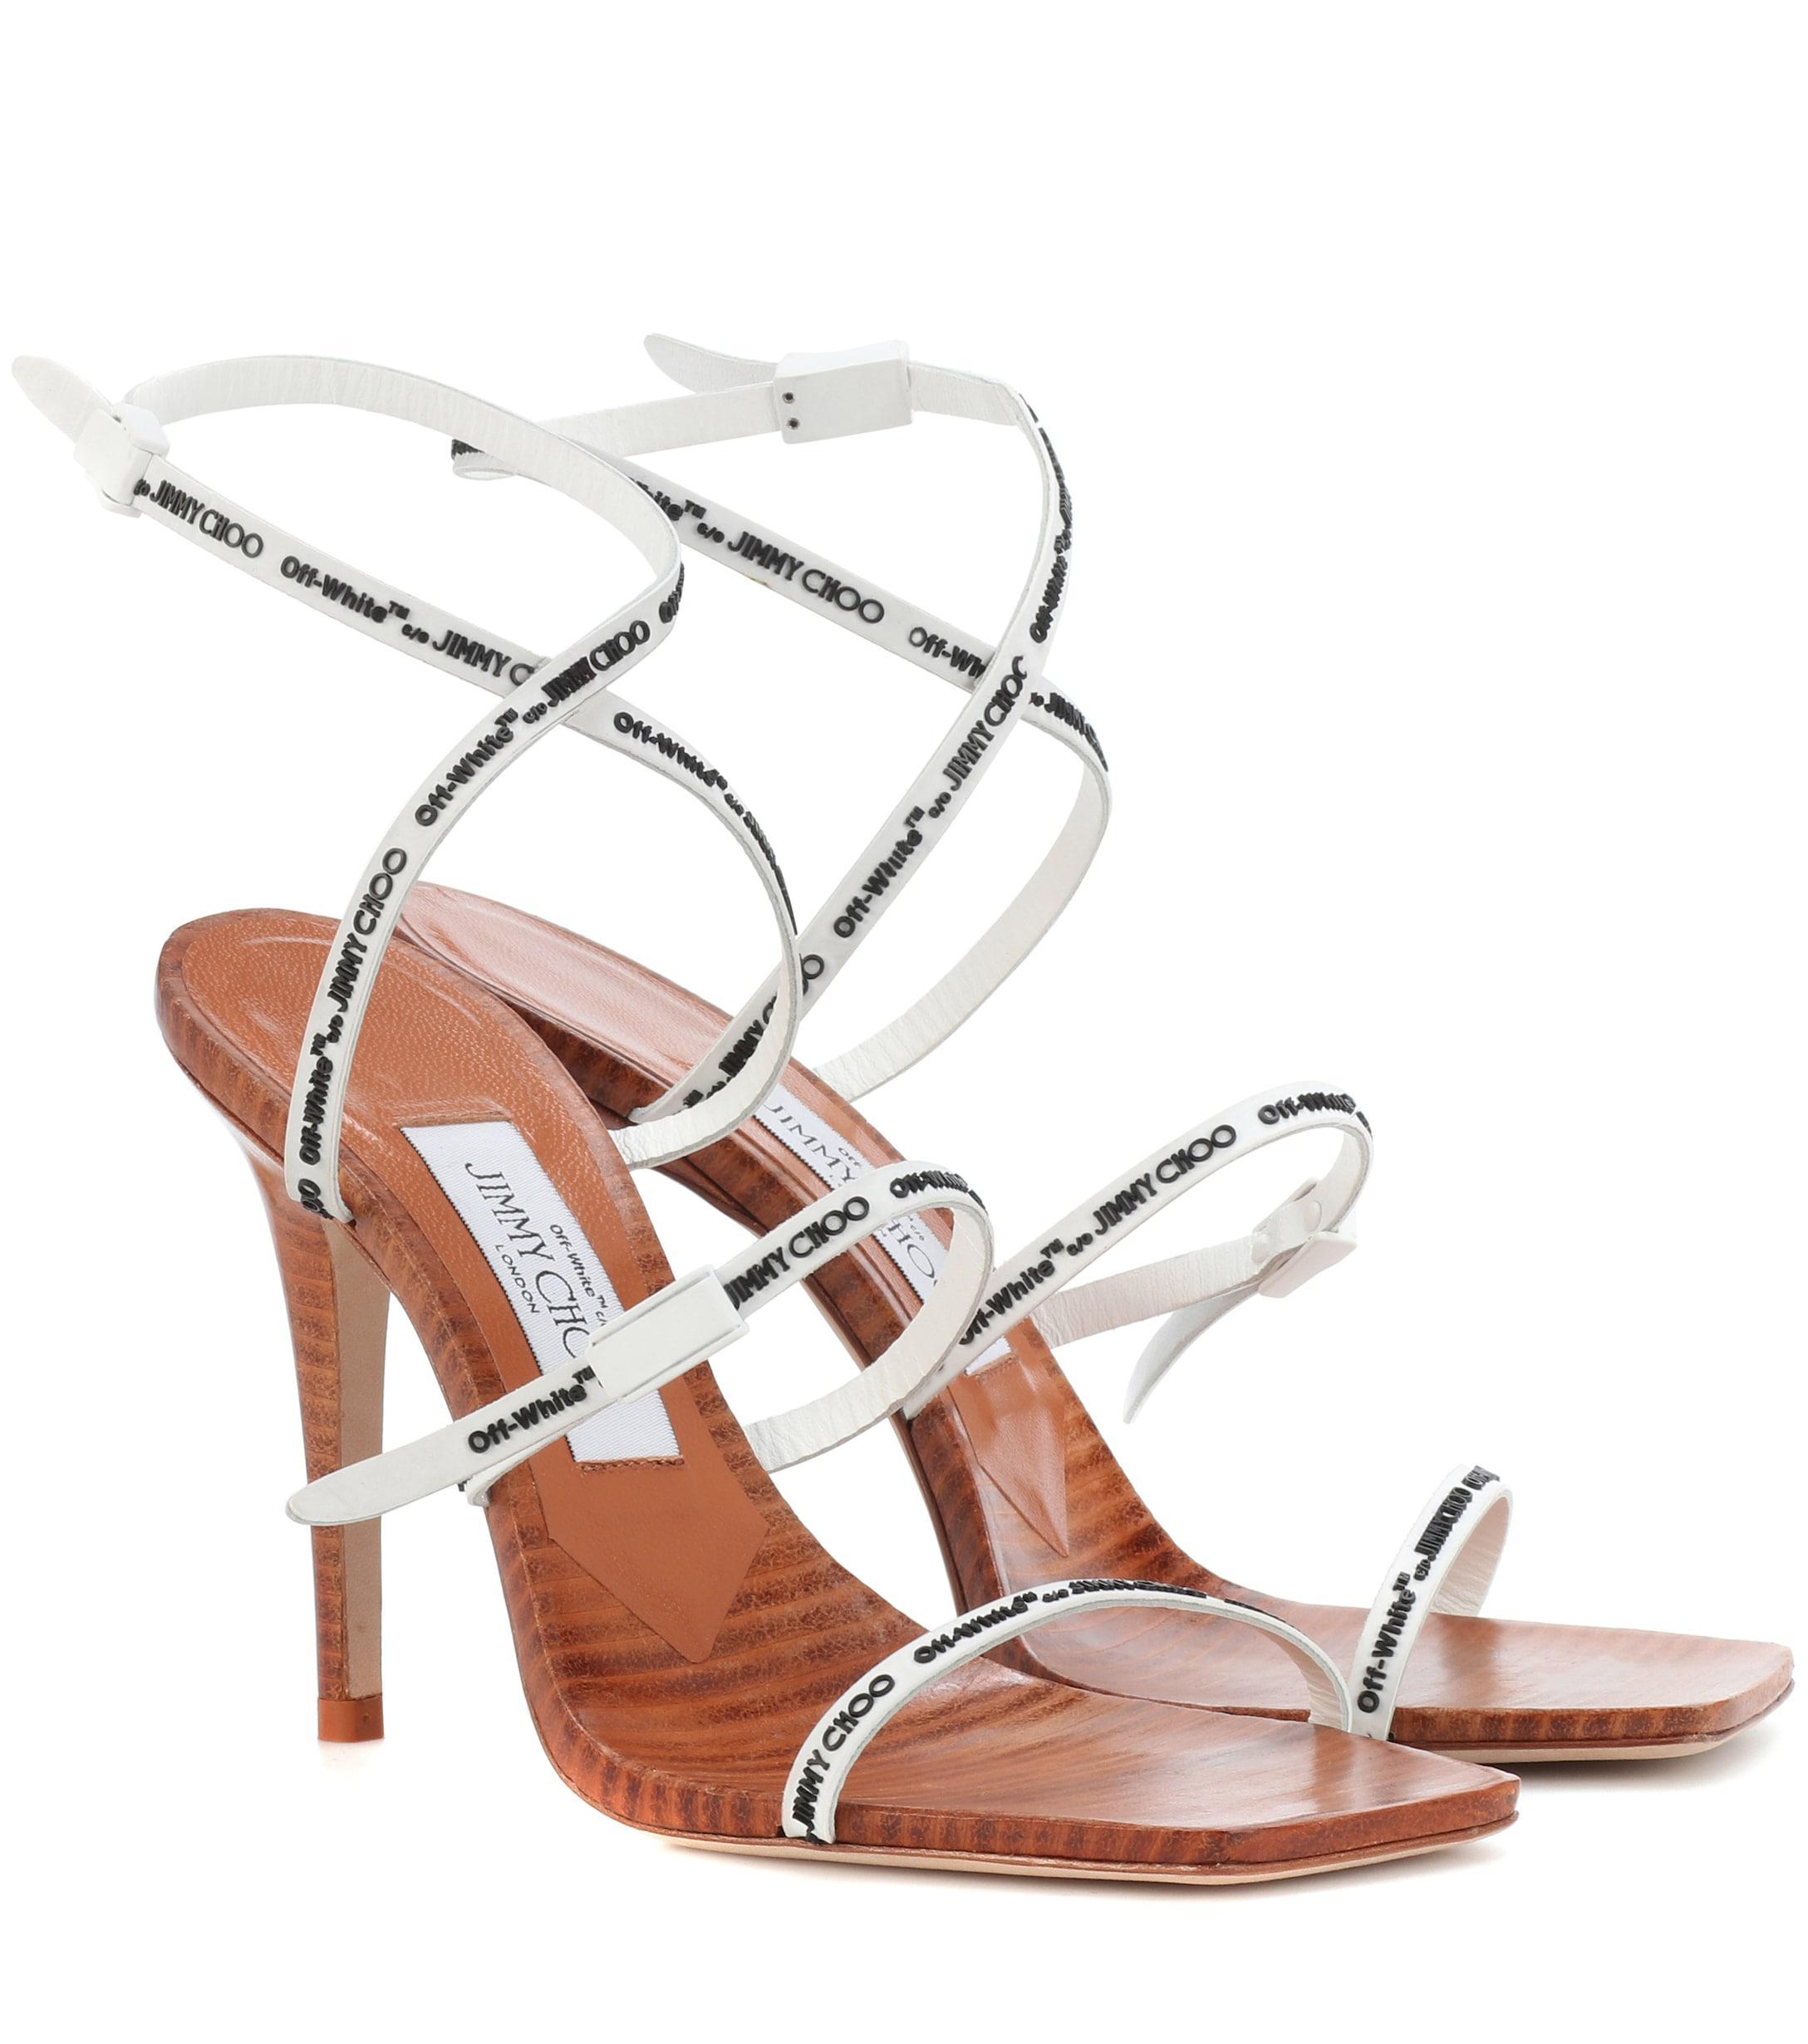 61fd481fc66 Lyst - Jimmy Choo X Off-white Jane 100 Sandals in White